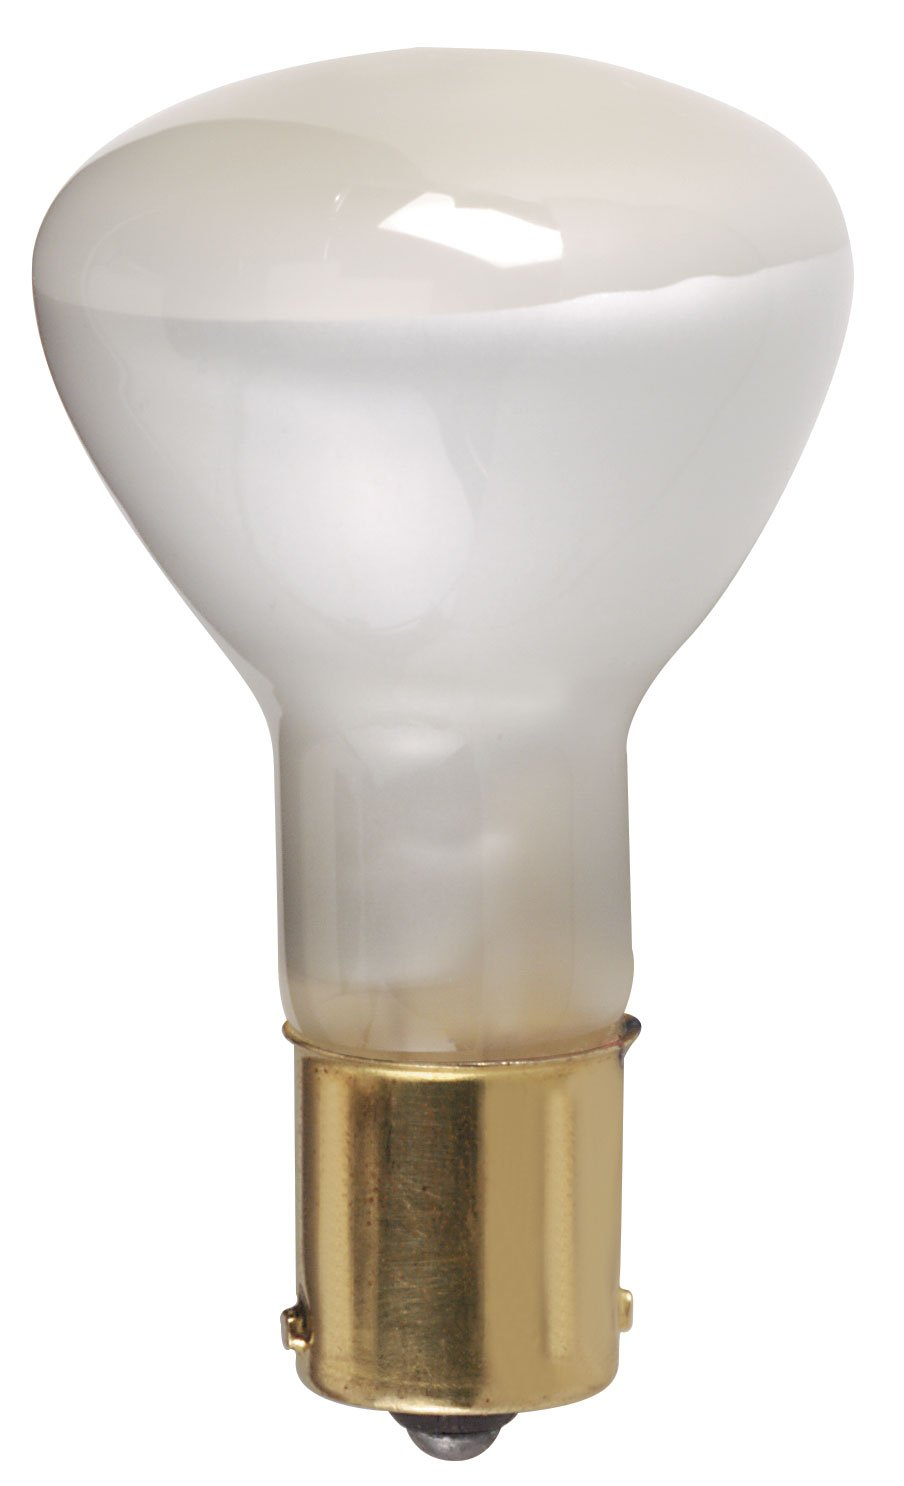 Satco S3618 SC Bayonet Base Shatterproof 20-Watt R11.5 Light Bulb Frosted Satco Products